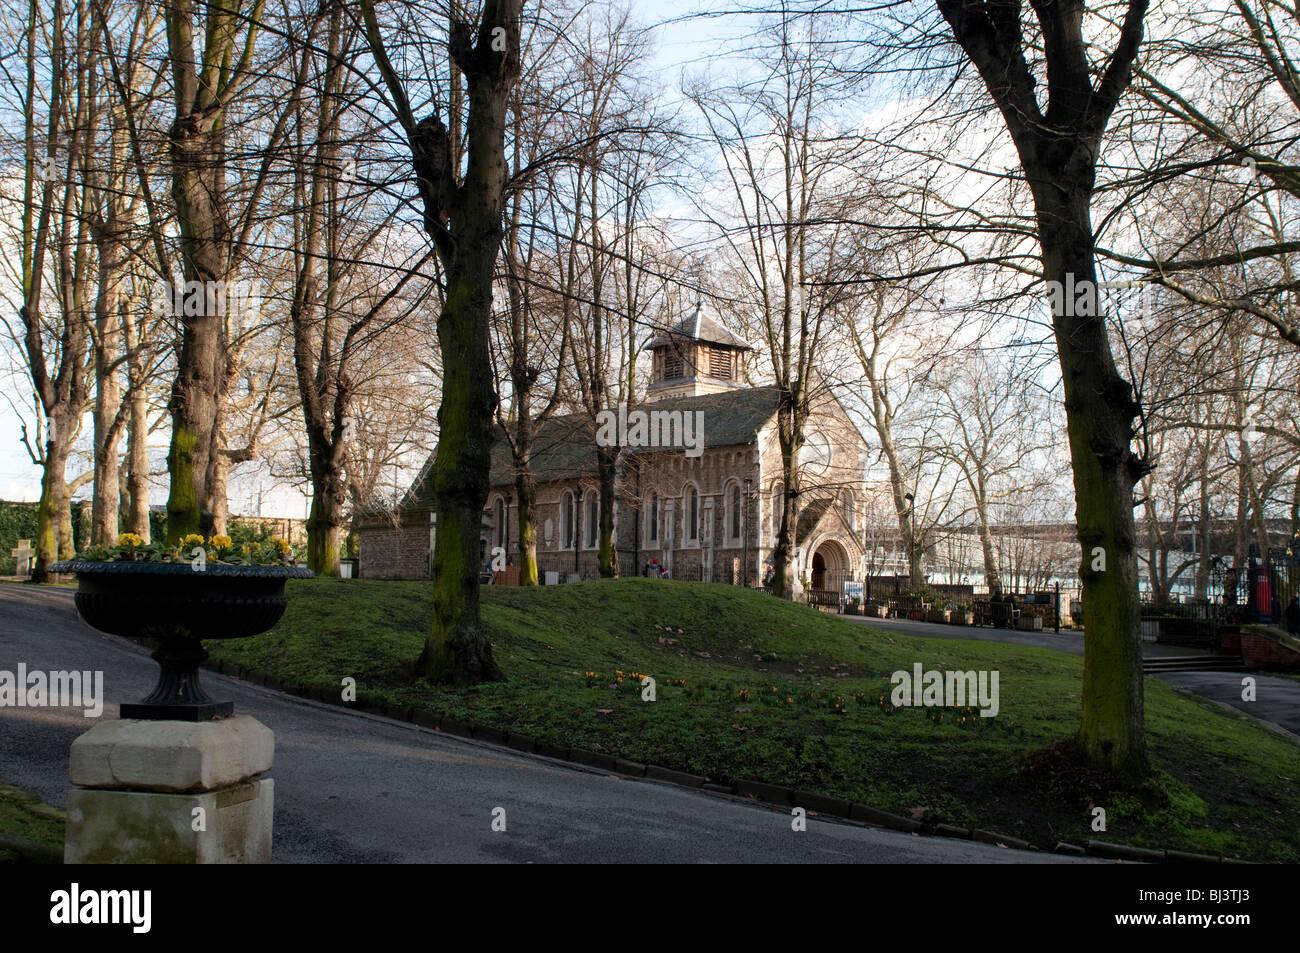 St Pancras Old Church, St Pancras Gardens, London Borough of Camden, UK - Stock Image